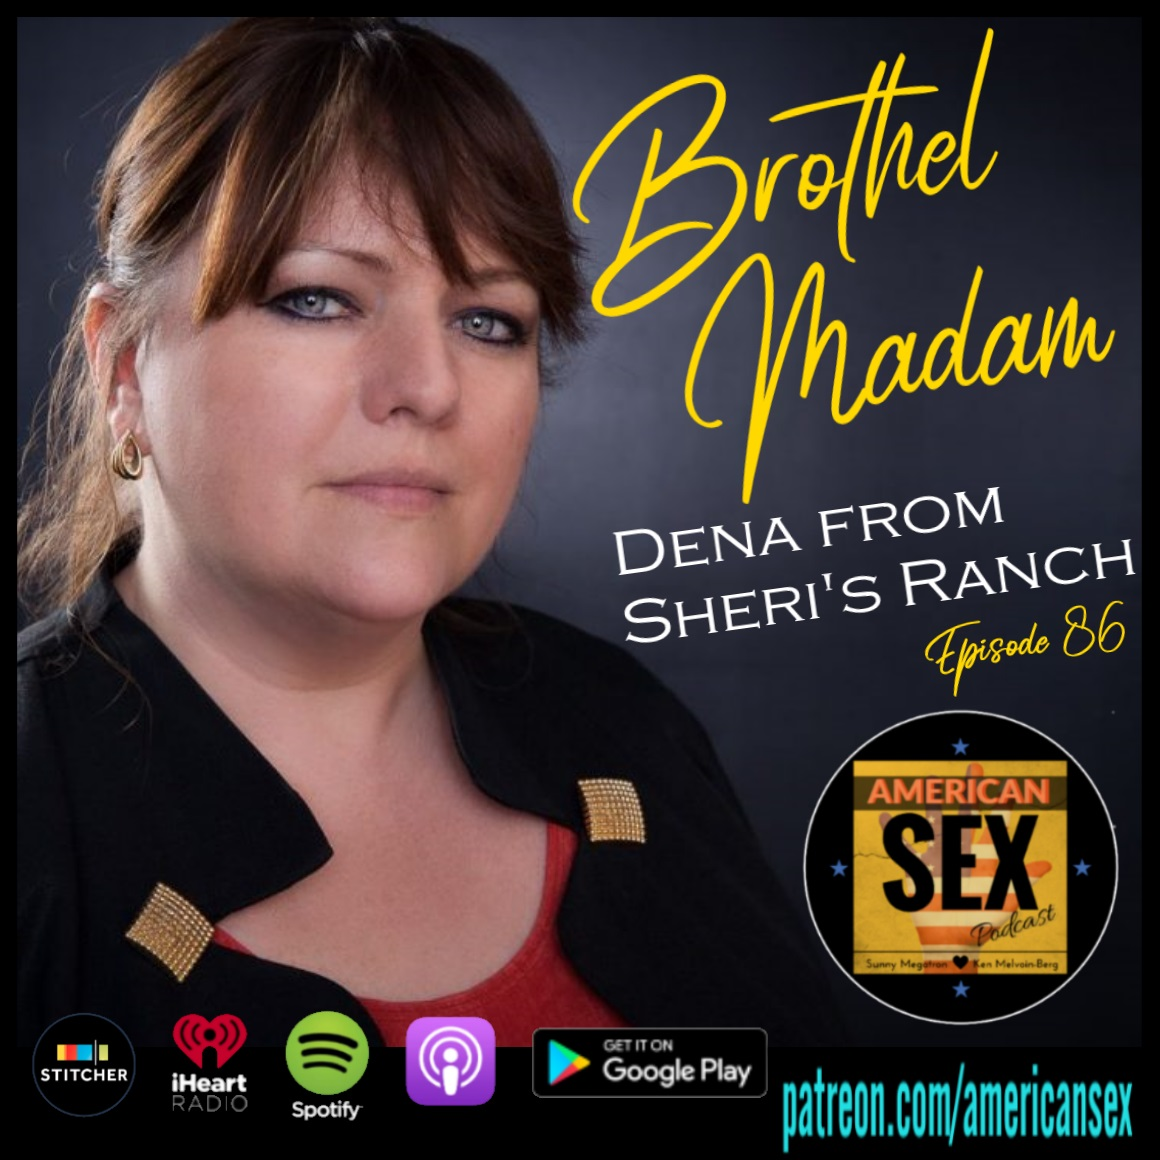 Brothel Madam Dena Sheris Ranch